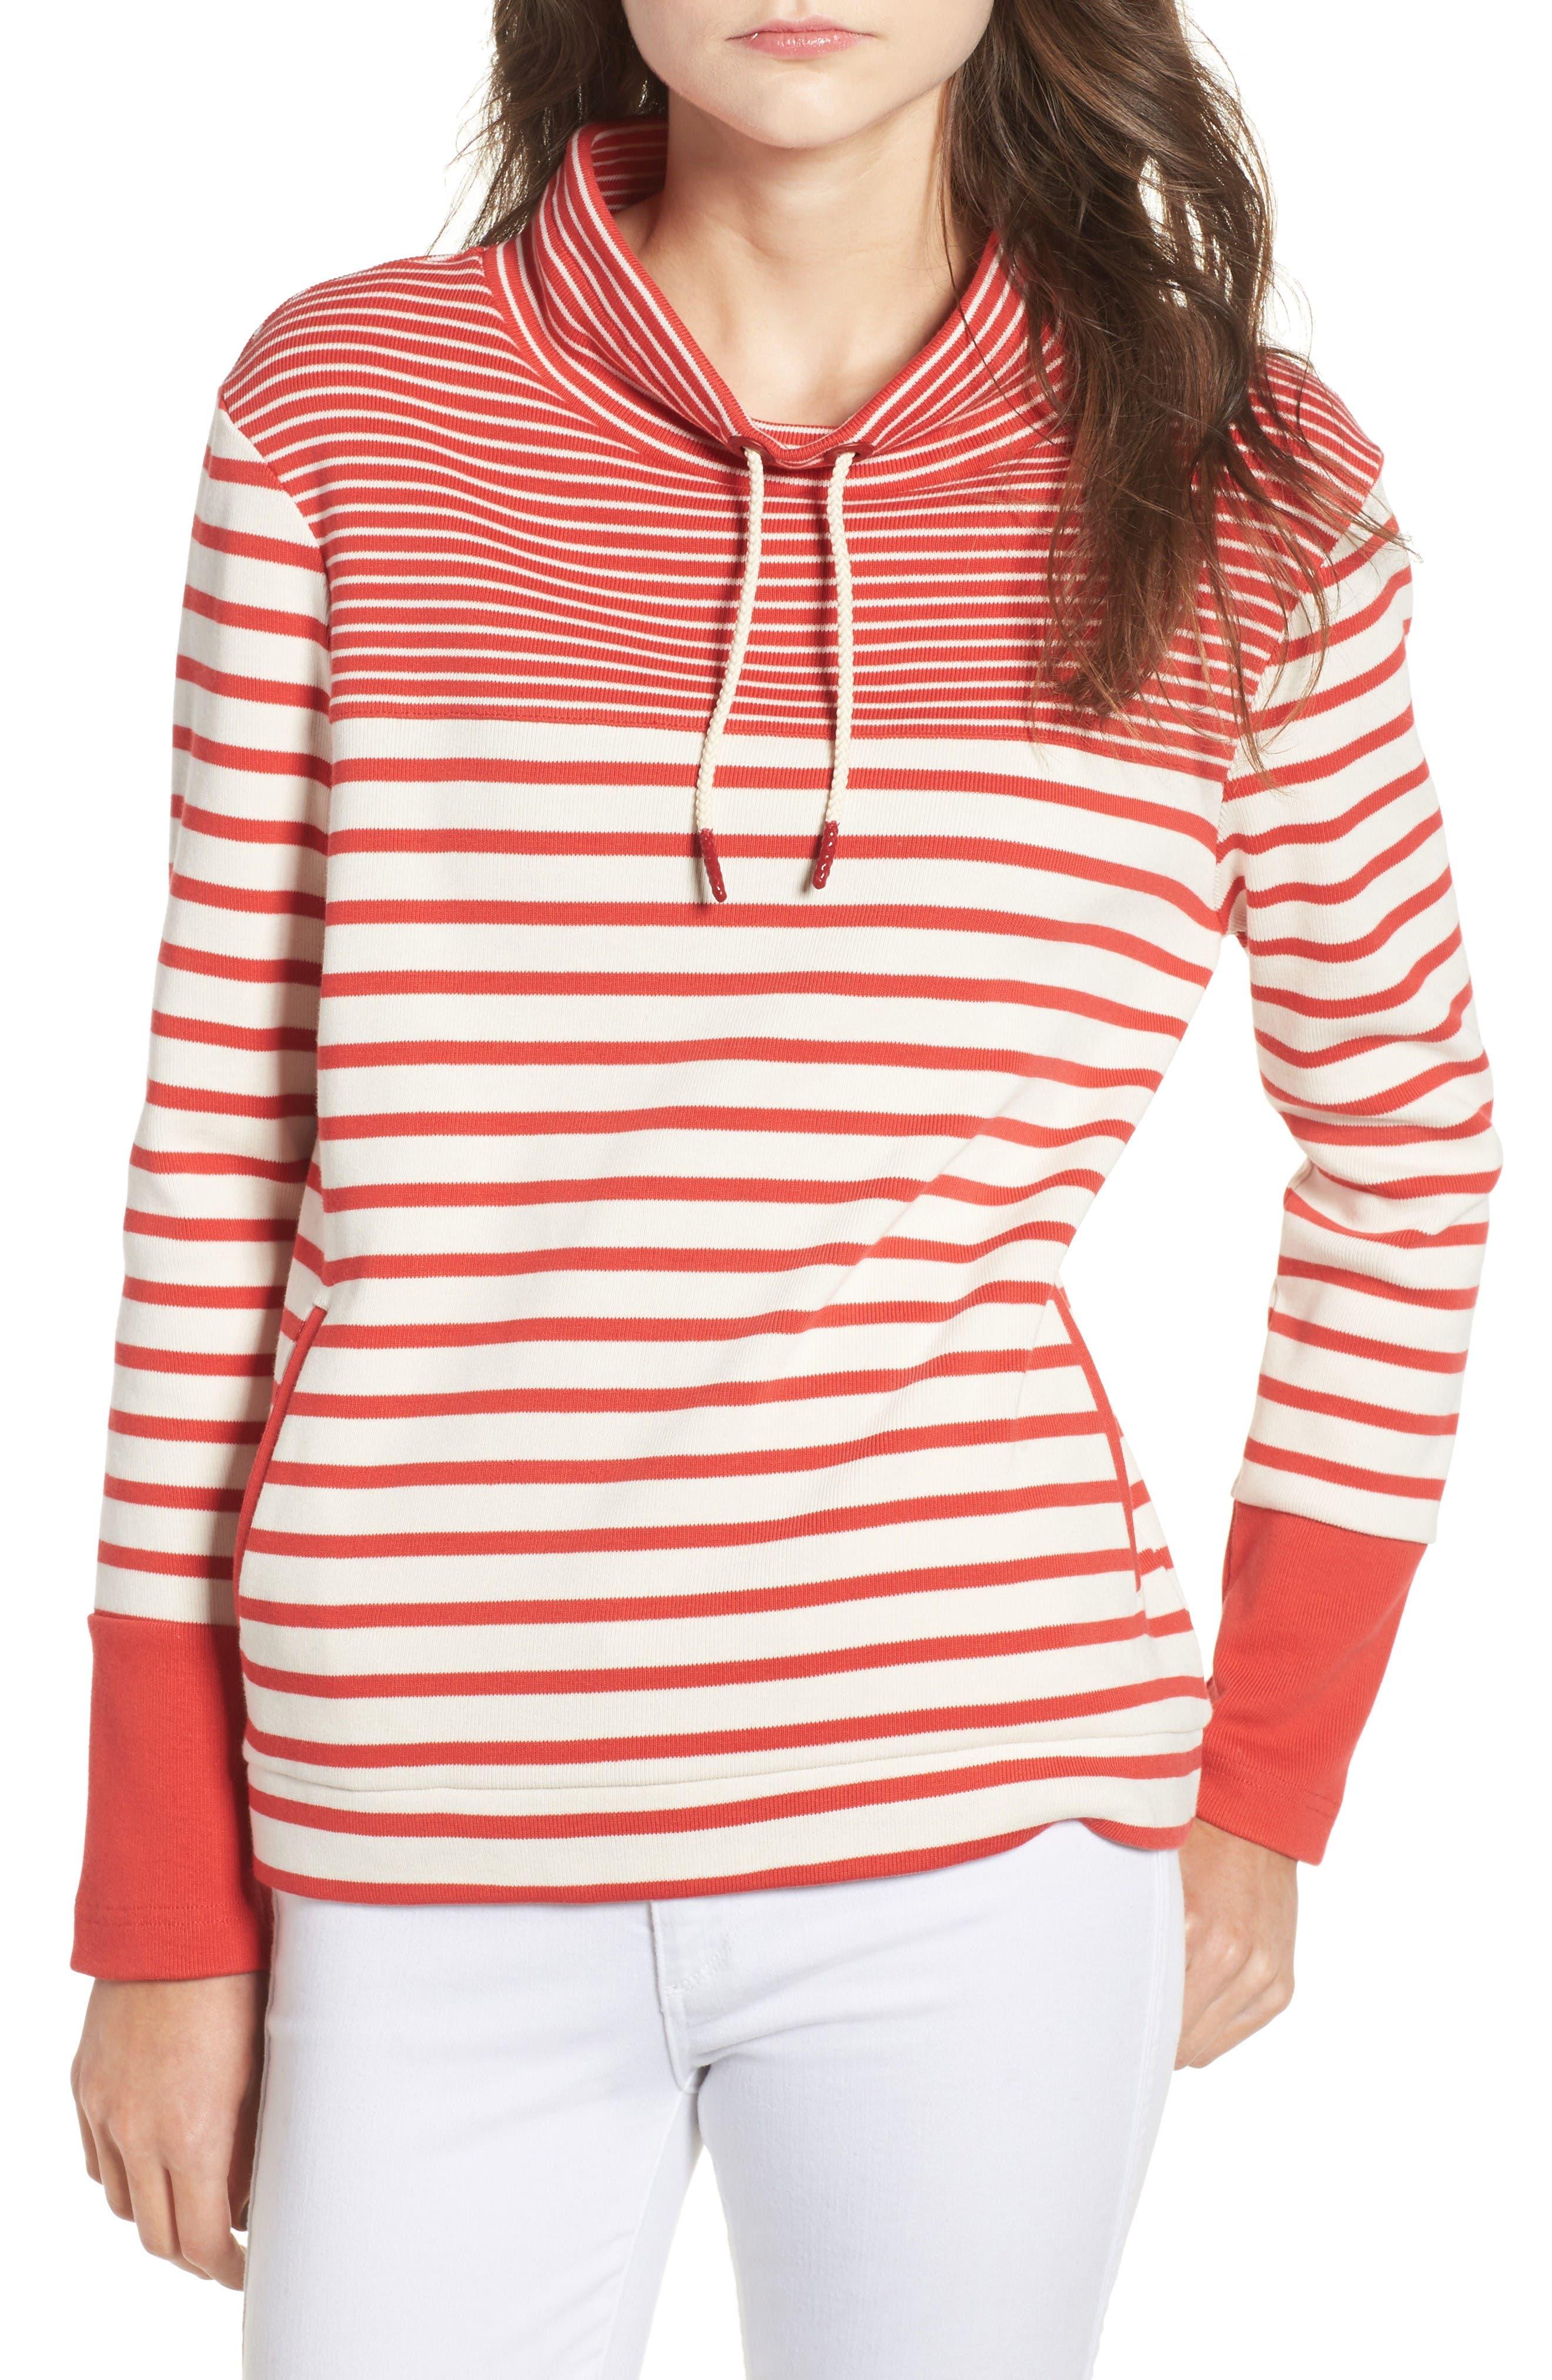 Barbour Rief Stripe Cotton Funnel Neck Sweater